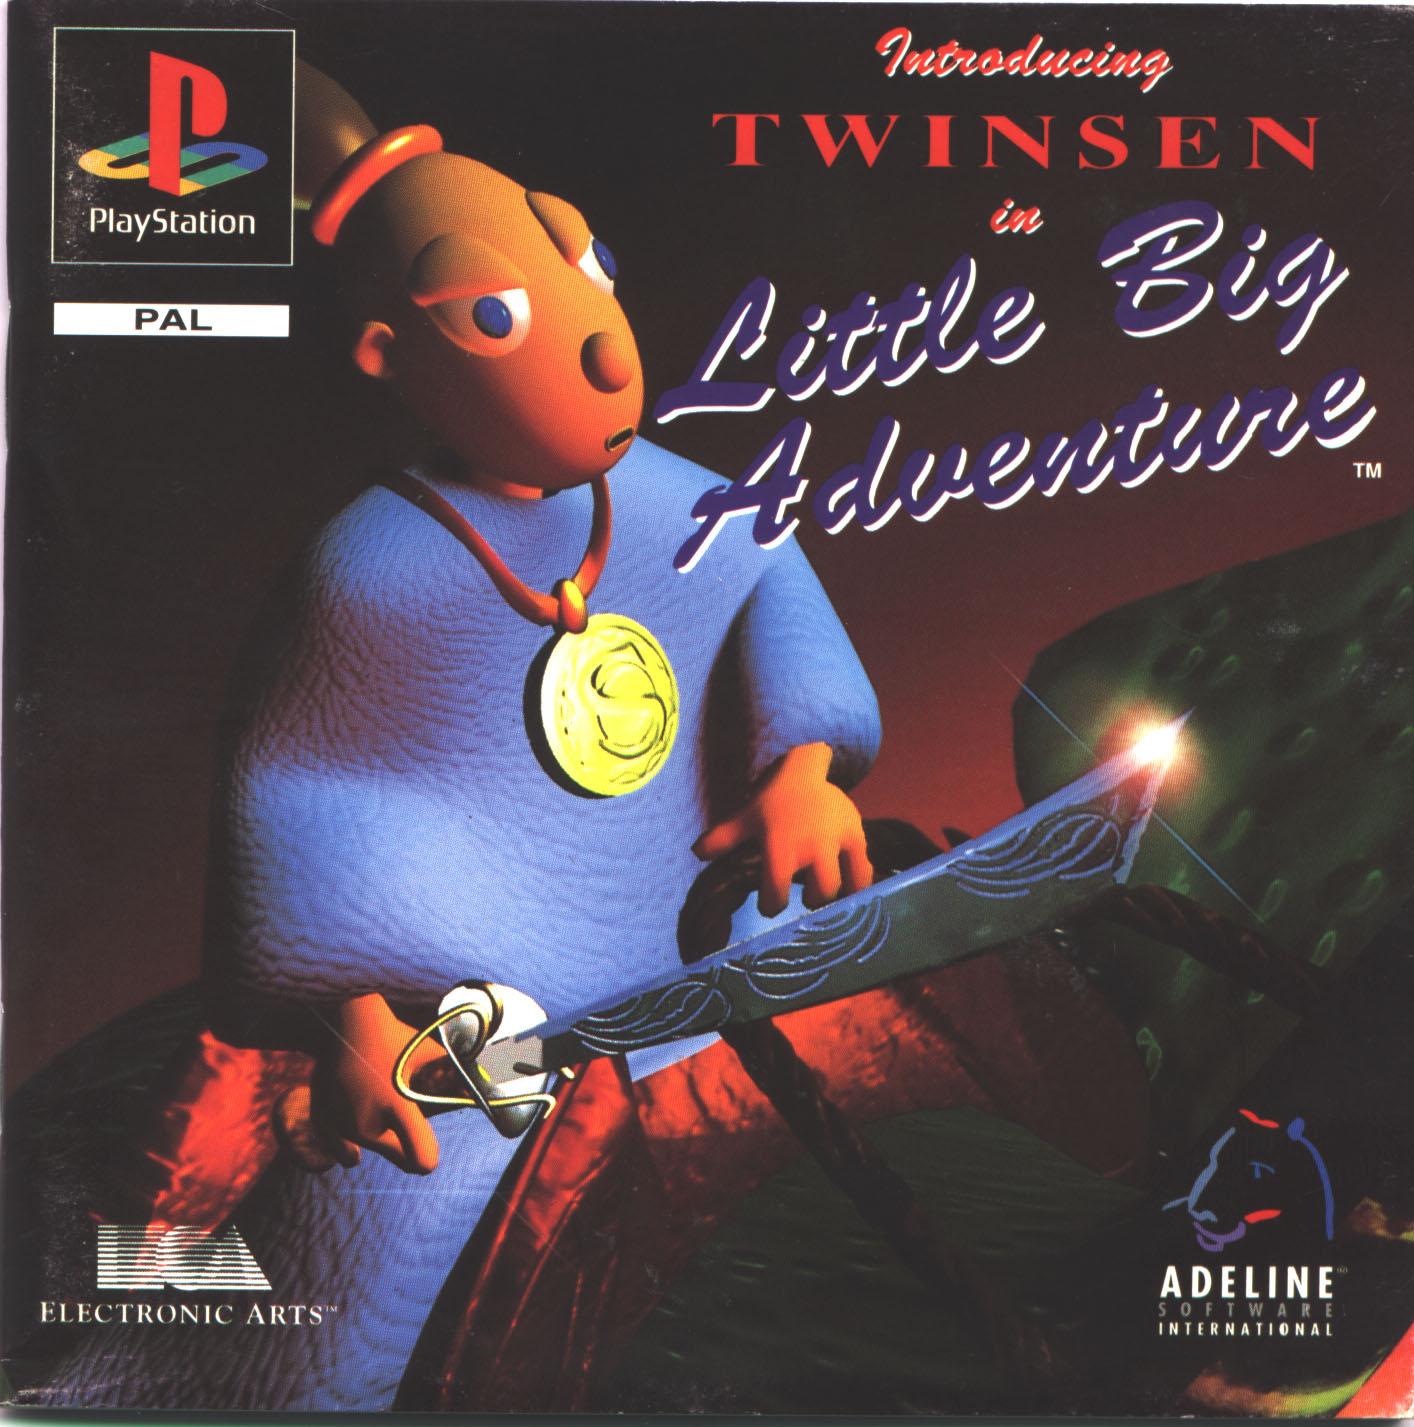 LittleBigAdventure PS Jaquette